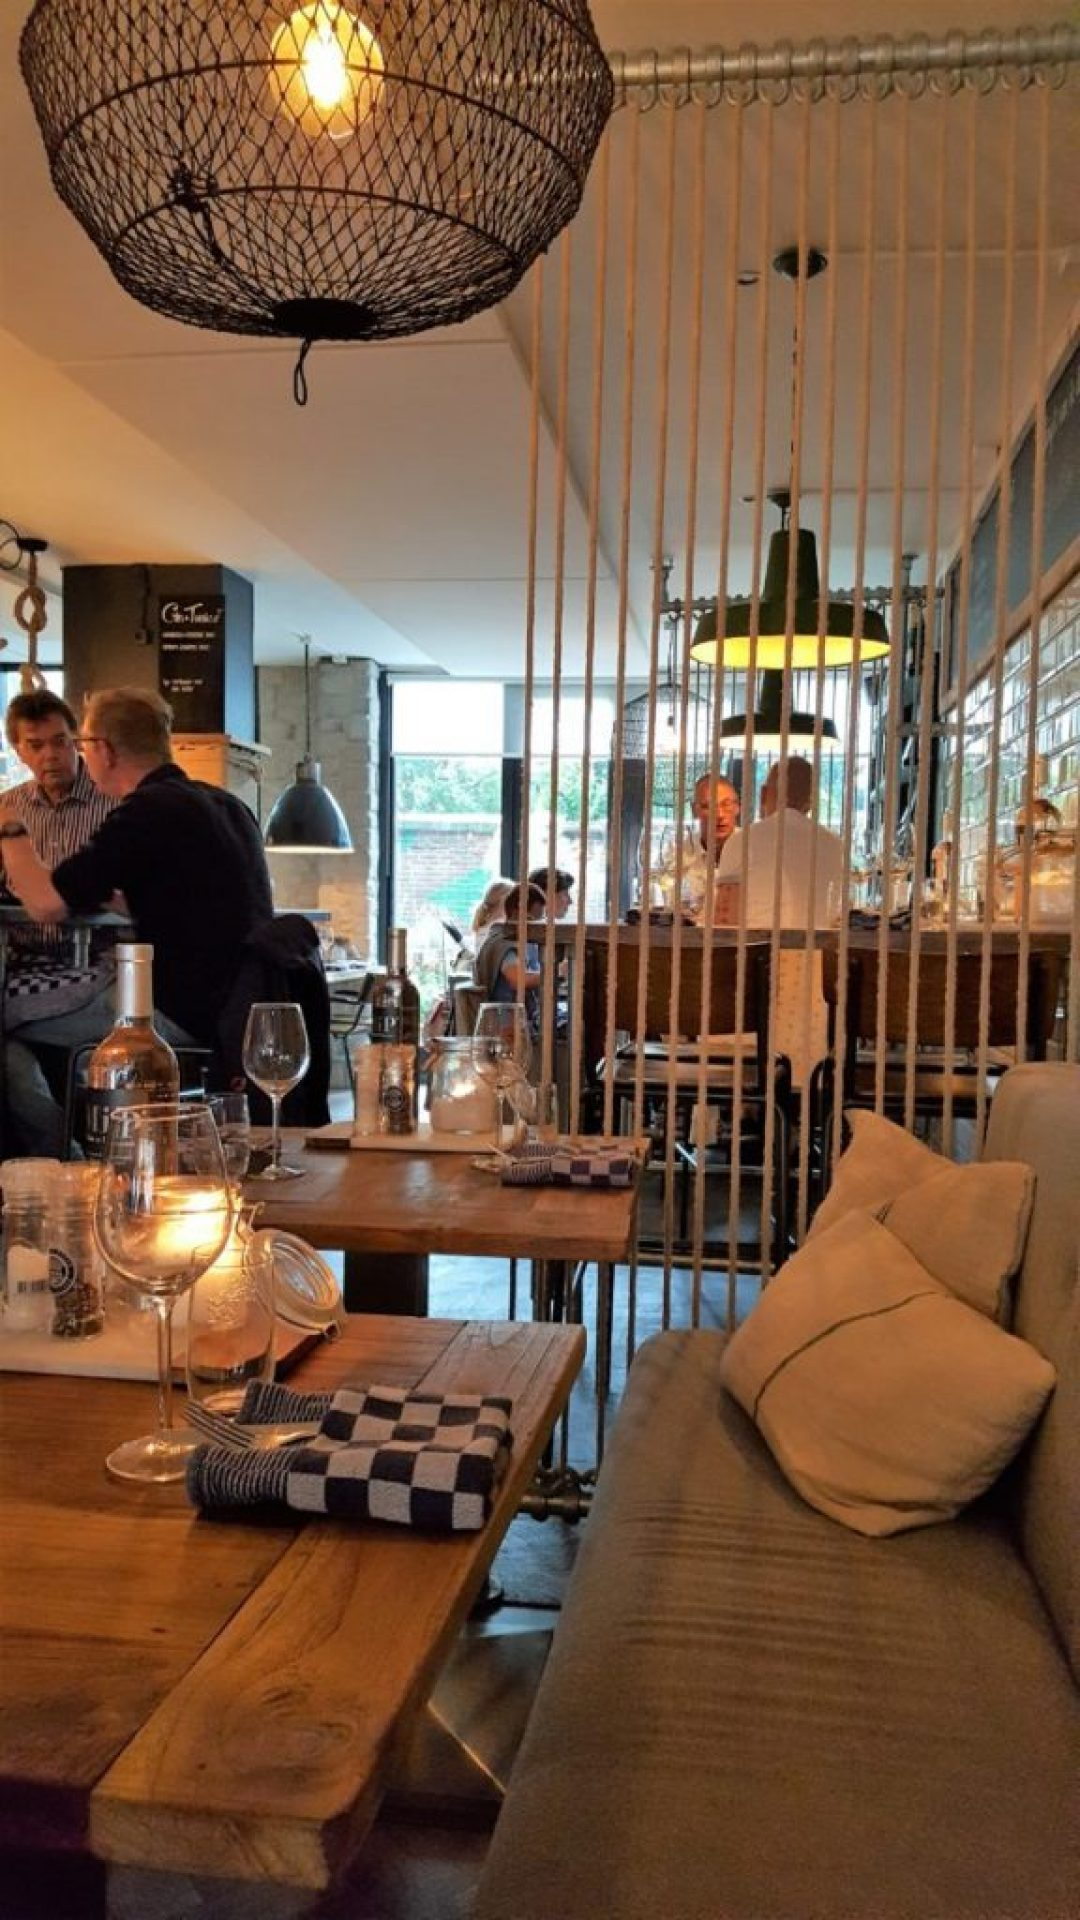 Visrestaurant Vigo: interieur